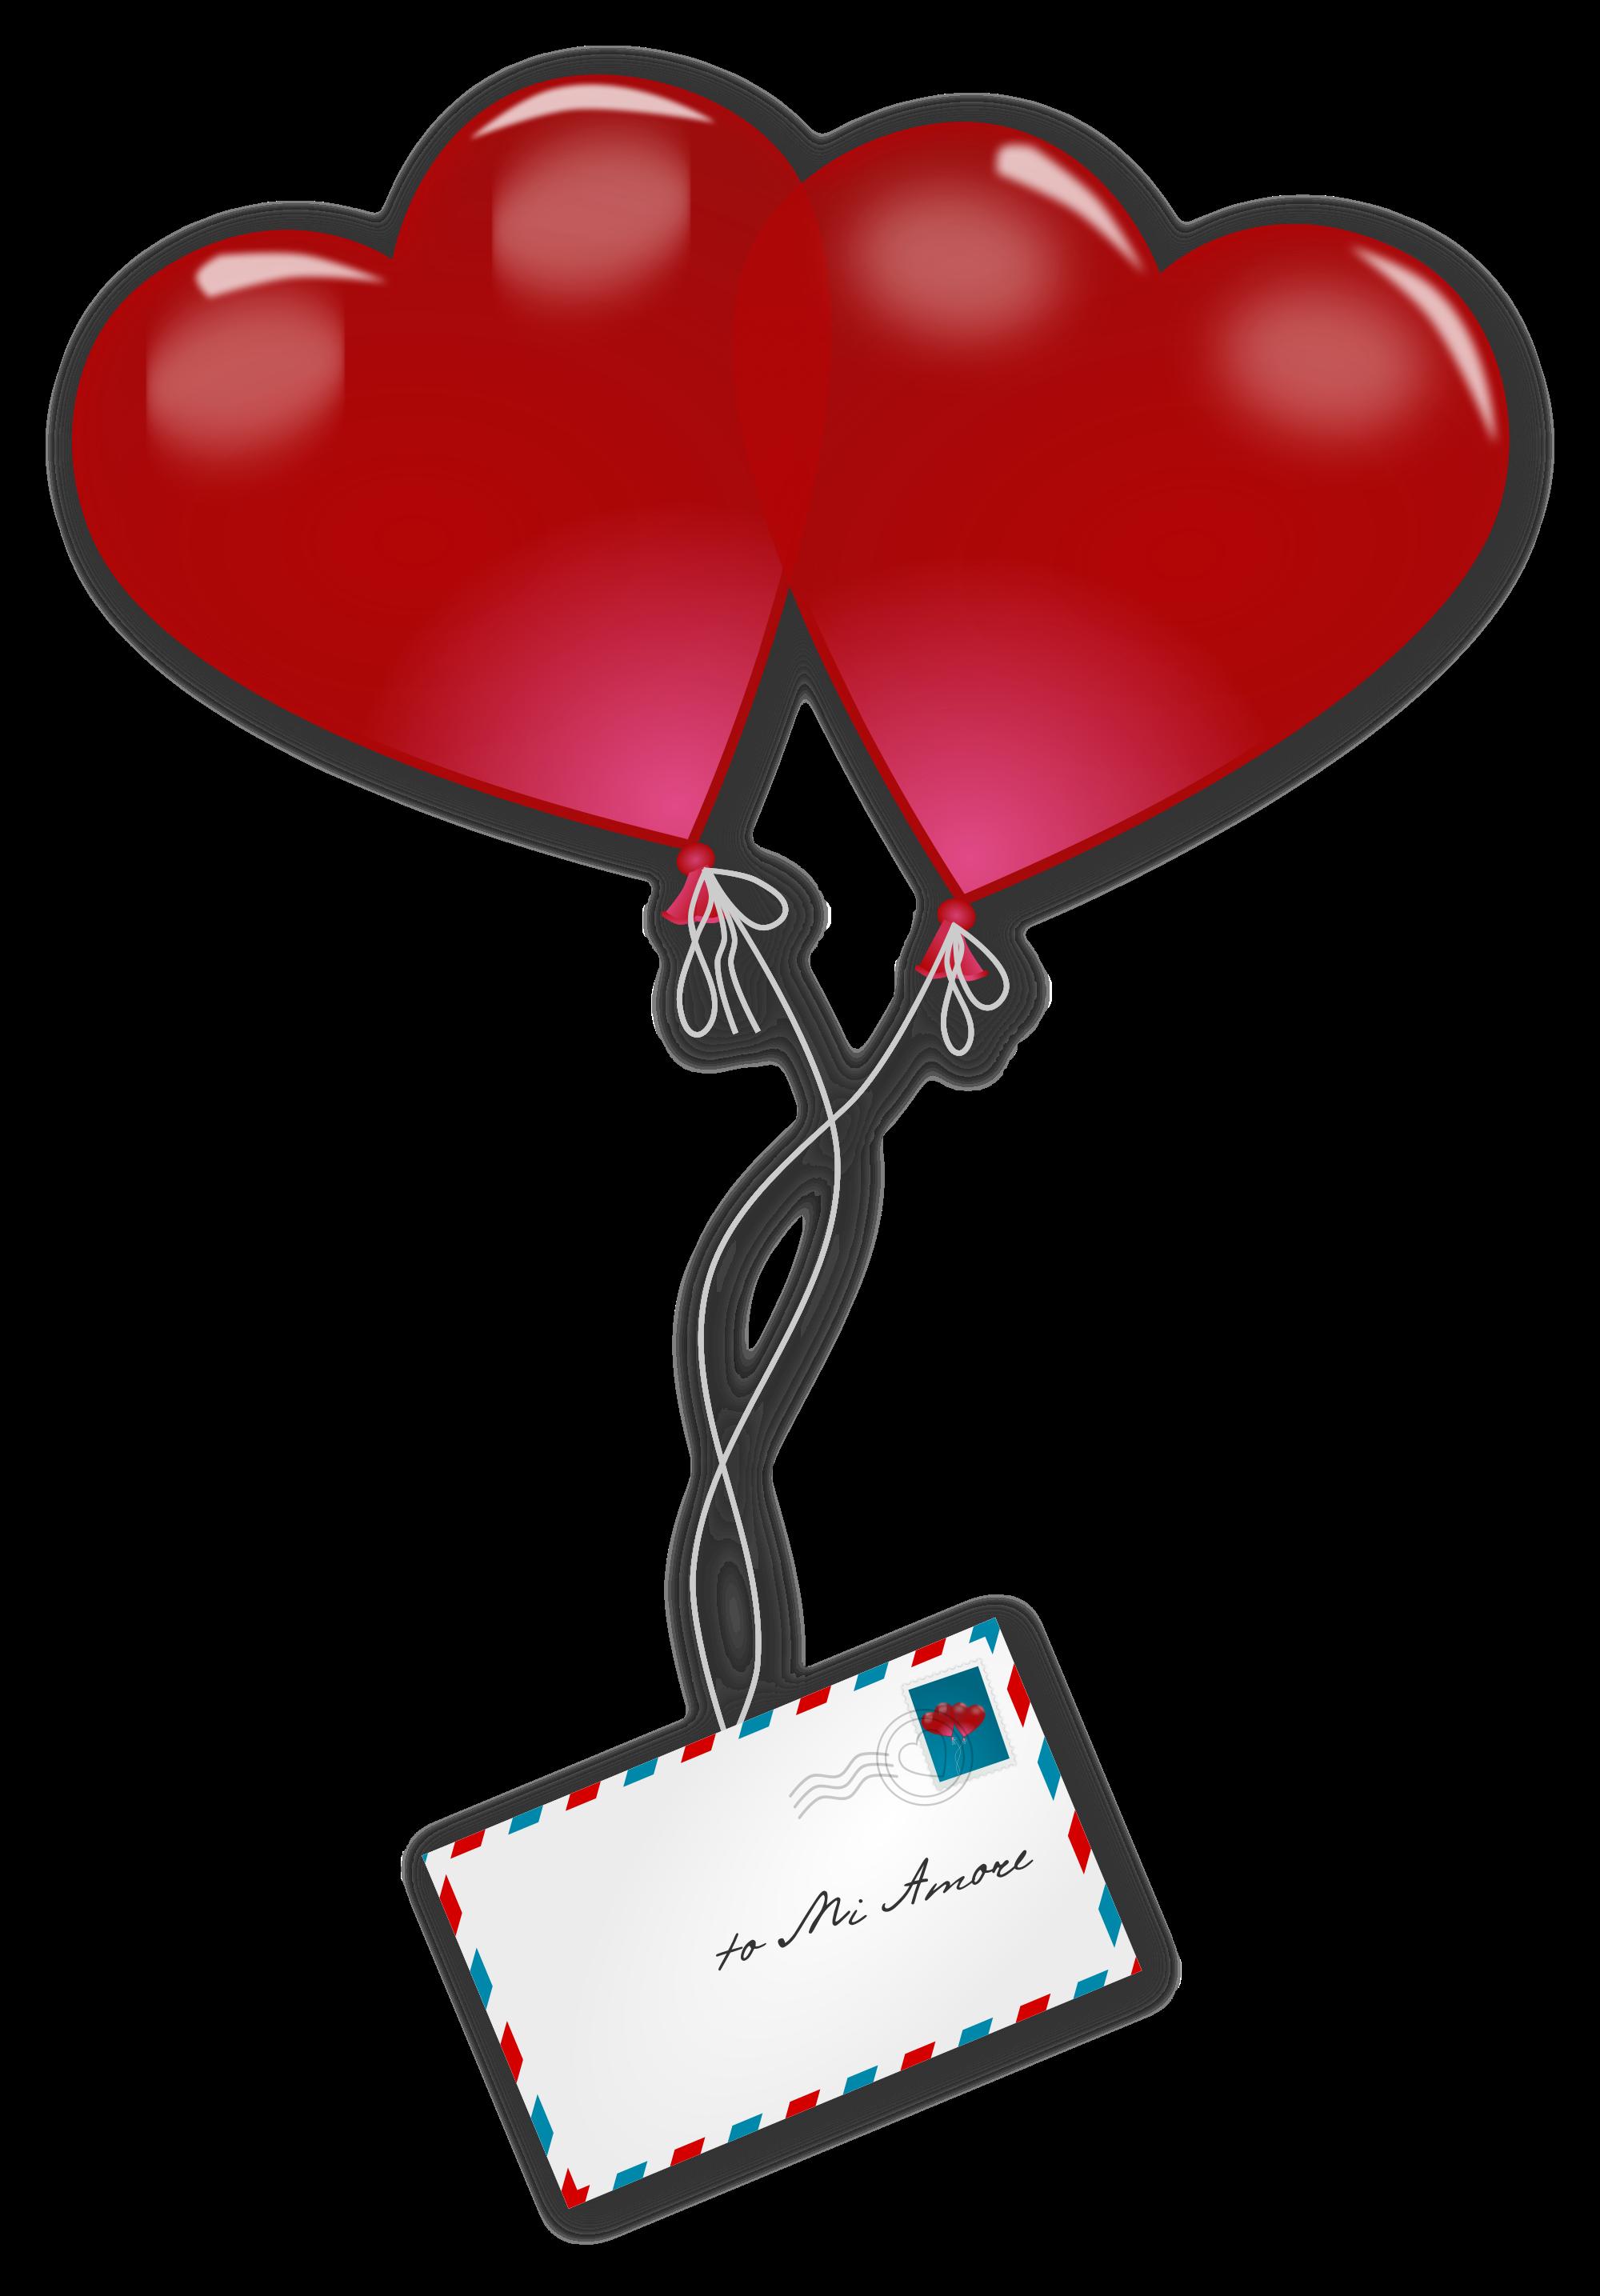 Clipart balloon valentines. File valentine s day